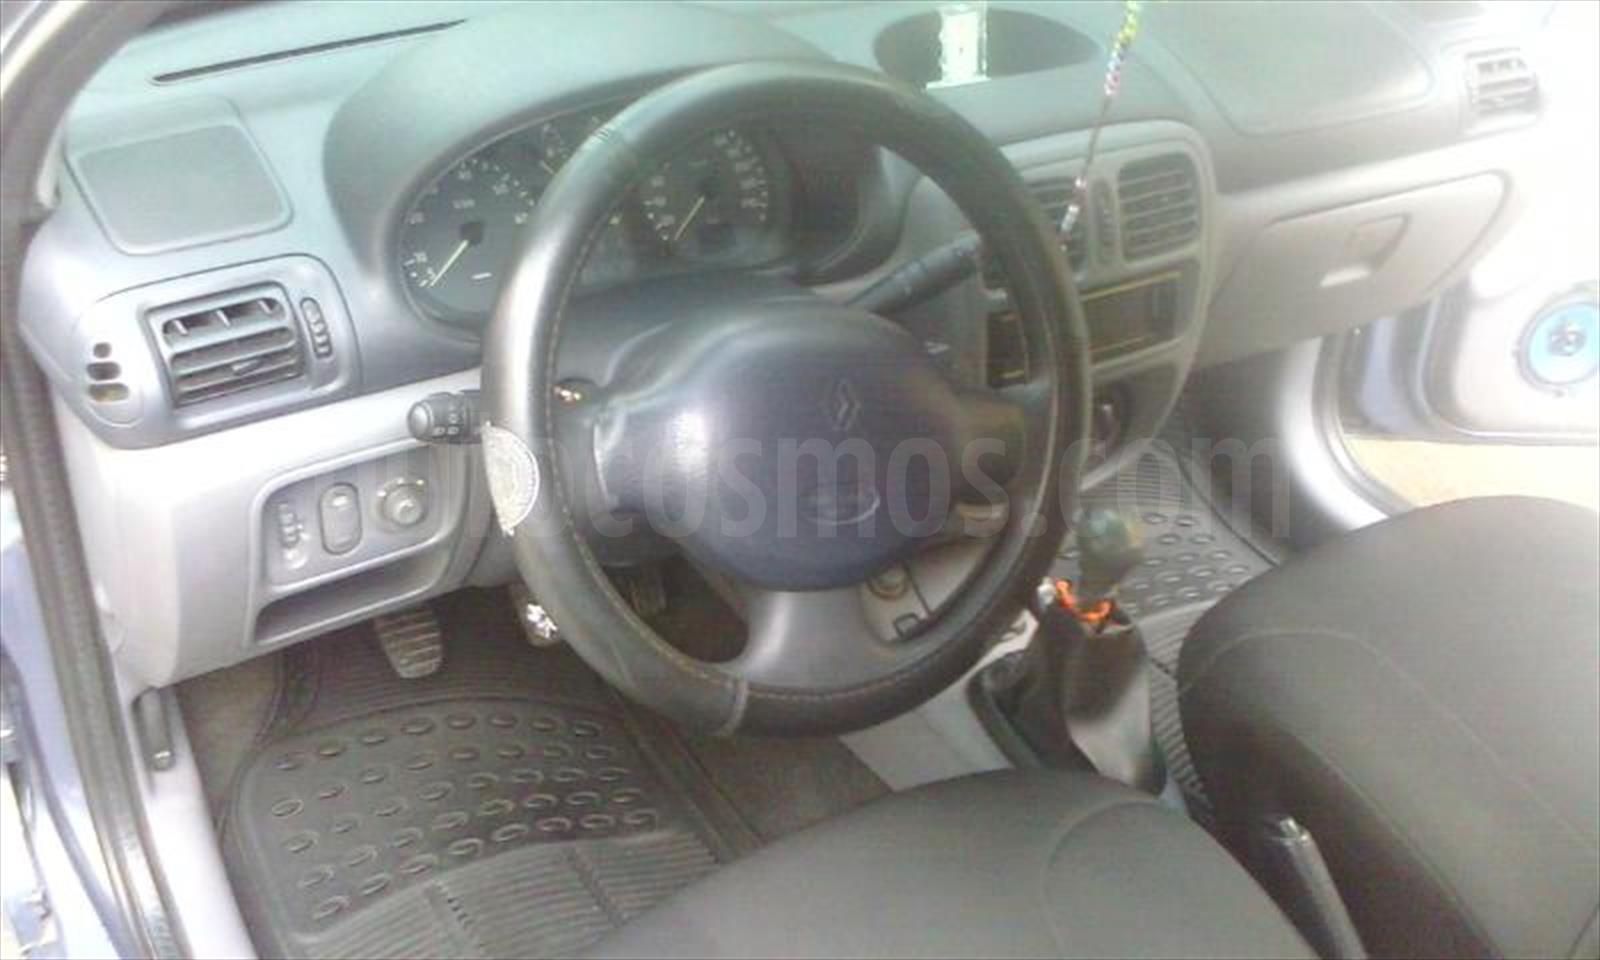 Venta carros usado - Distrito Capital - Renault Clio RT